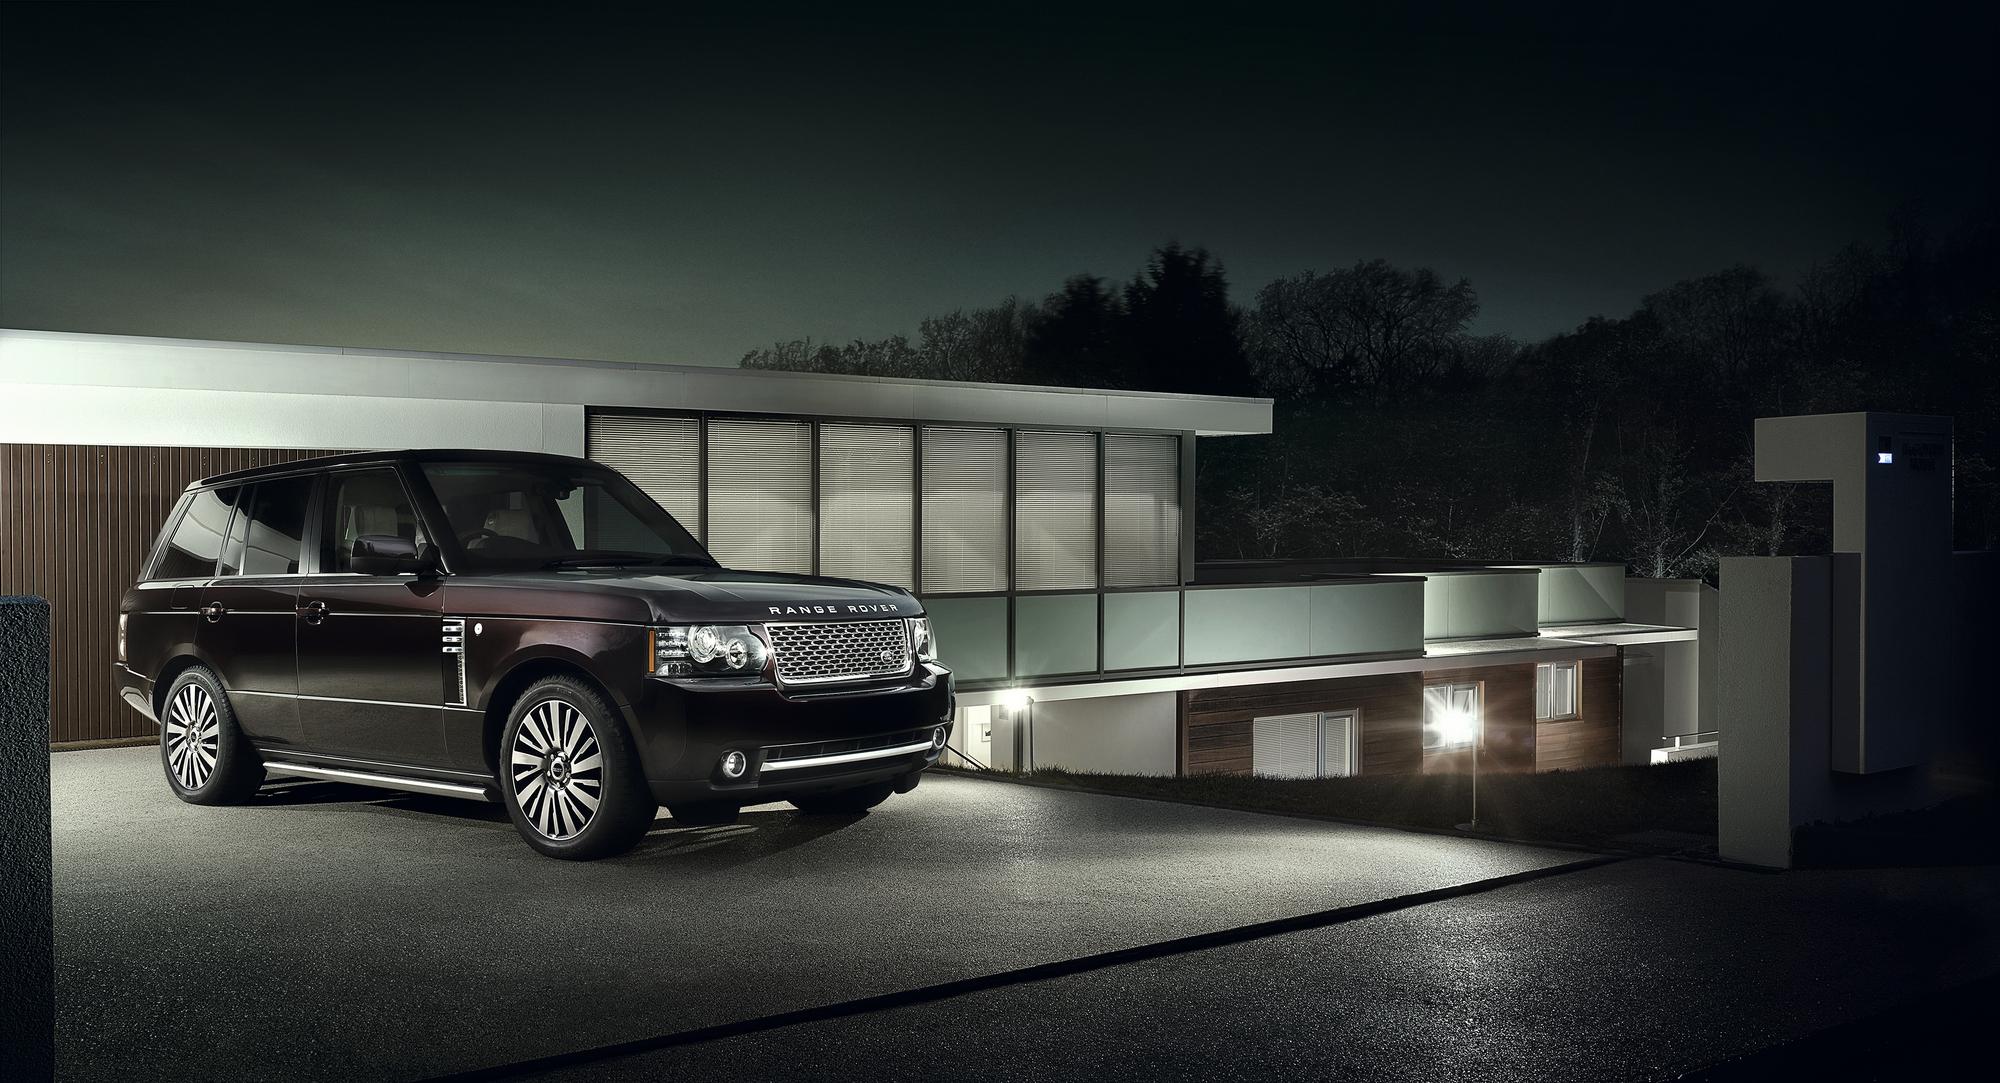 45 Land Rover Range Rover LR V8 Supercharged Top 50 Whips